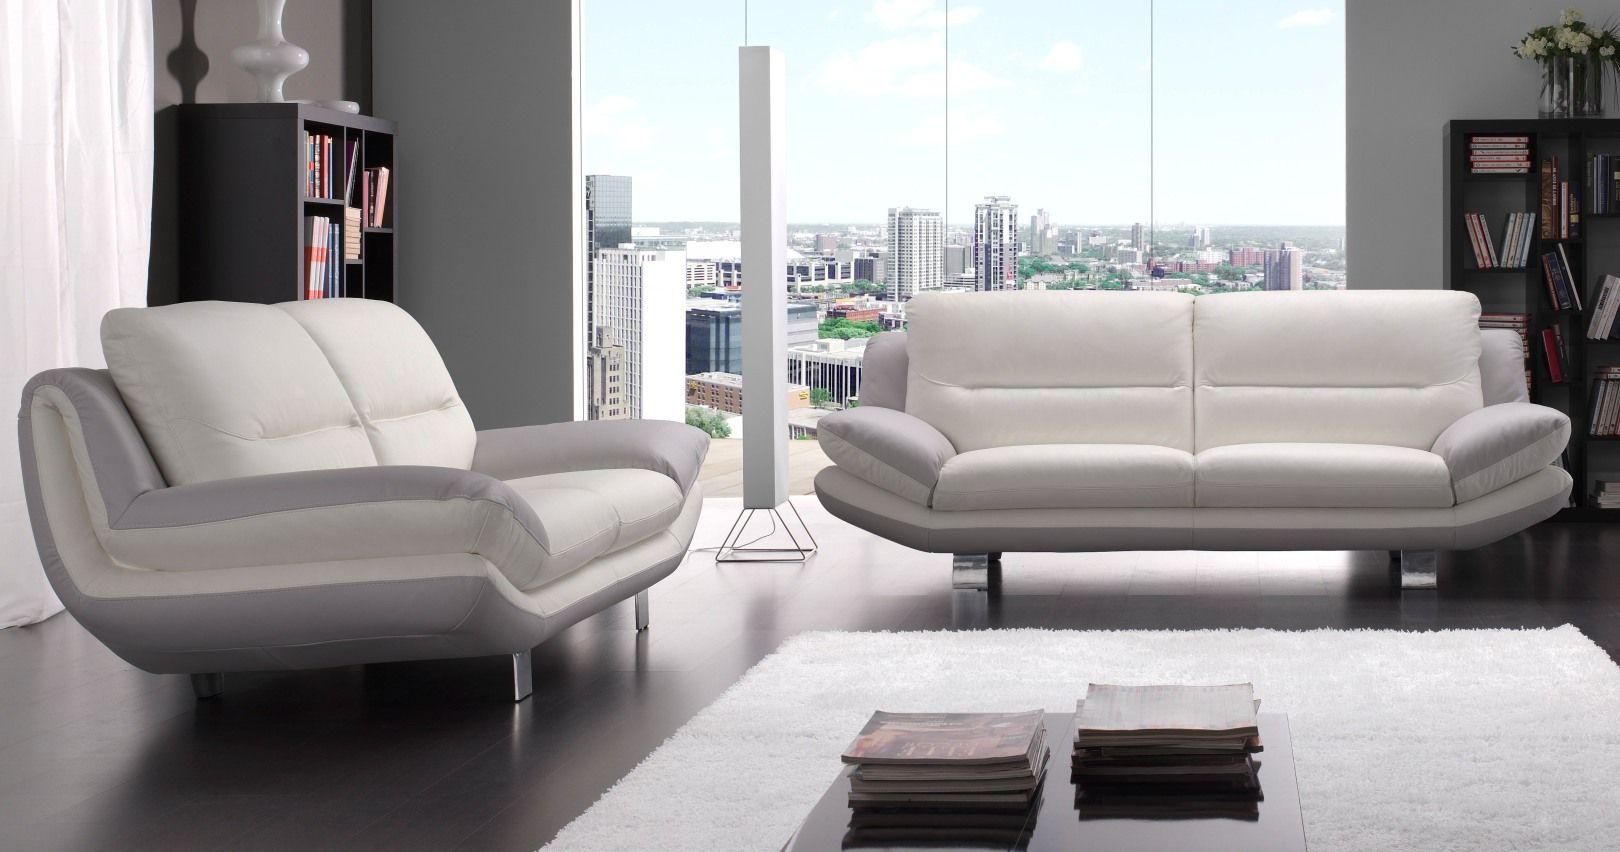 nashik salon 32 bicolore ou unicolore - Canape Cuir Moderne Contemporain